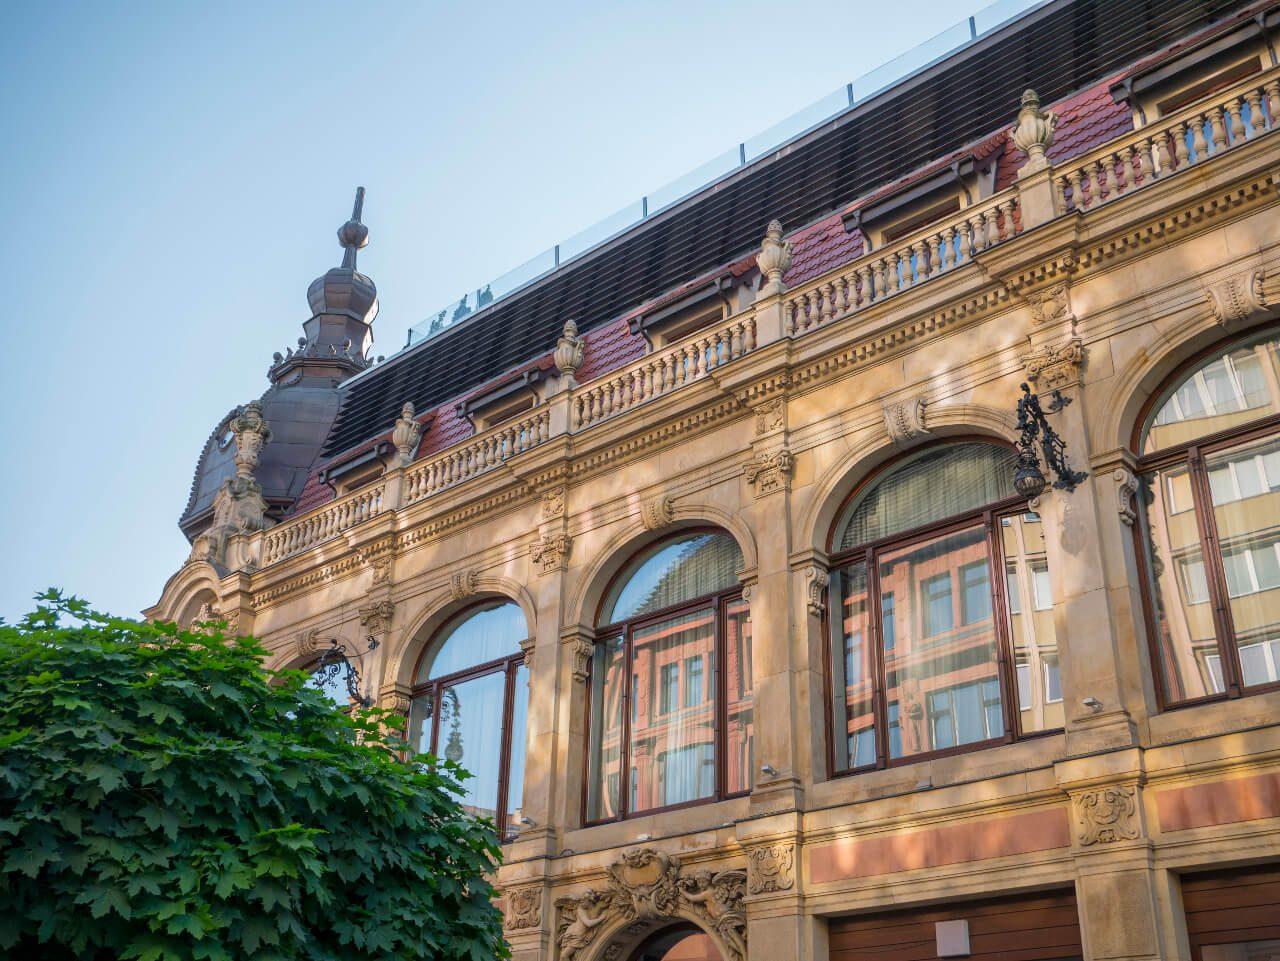 Fasada Hotelu Monopol we Wrocławiu